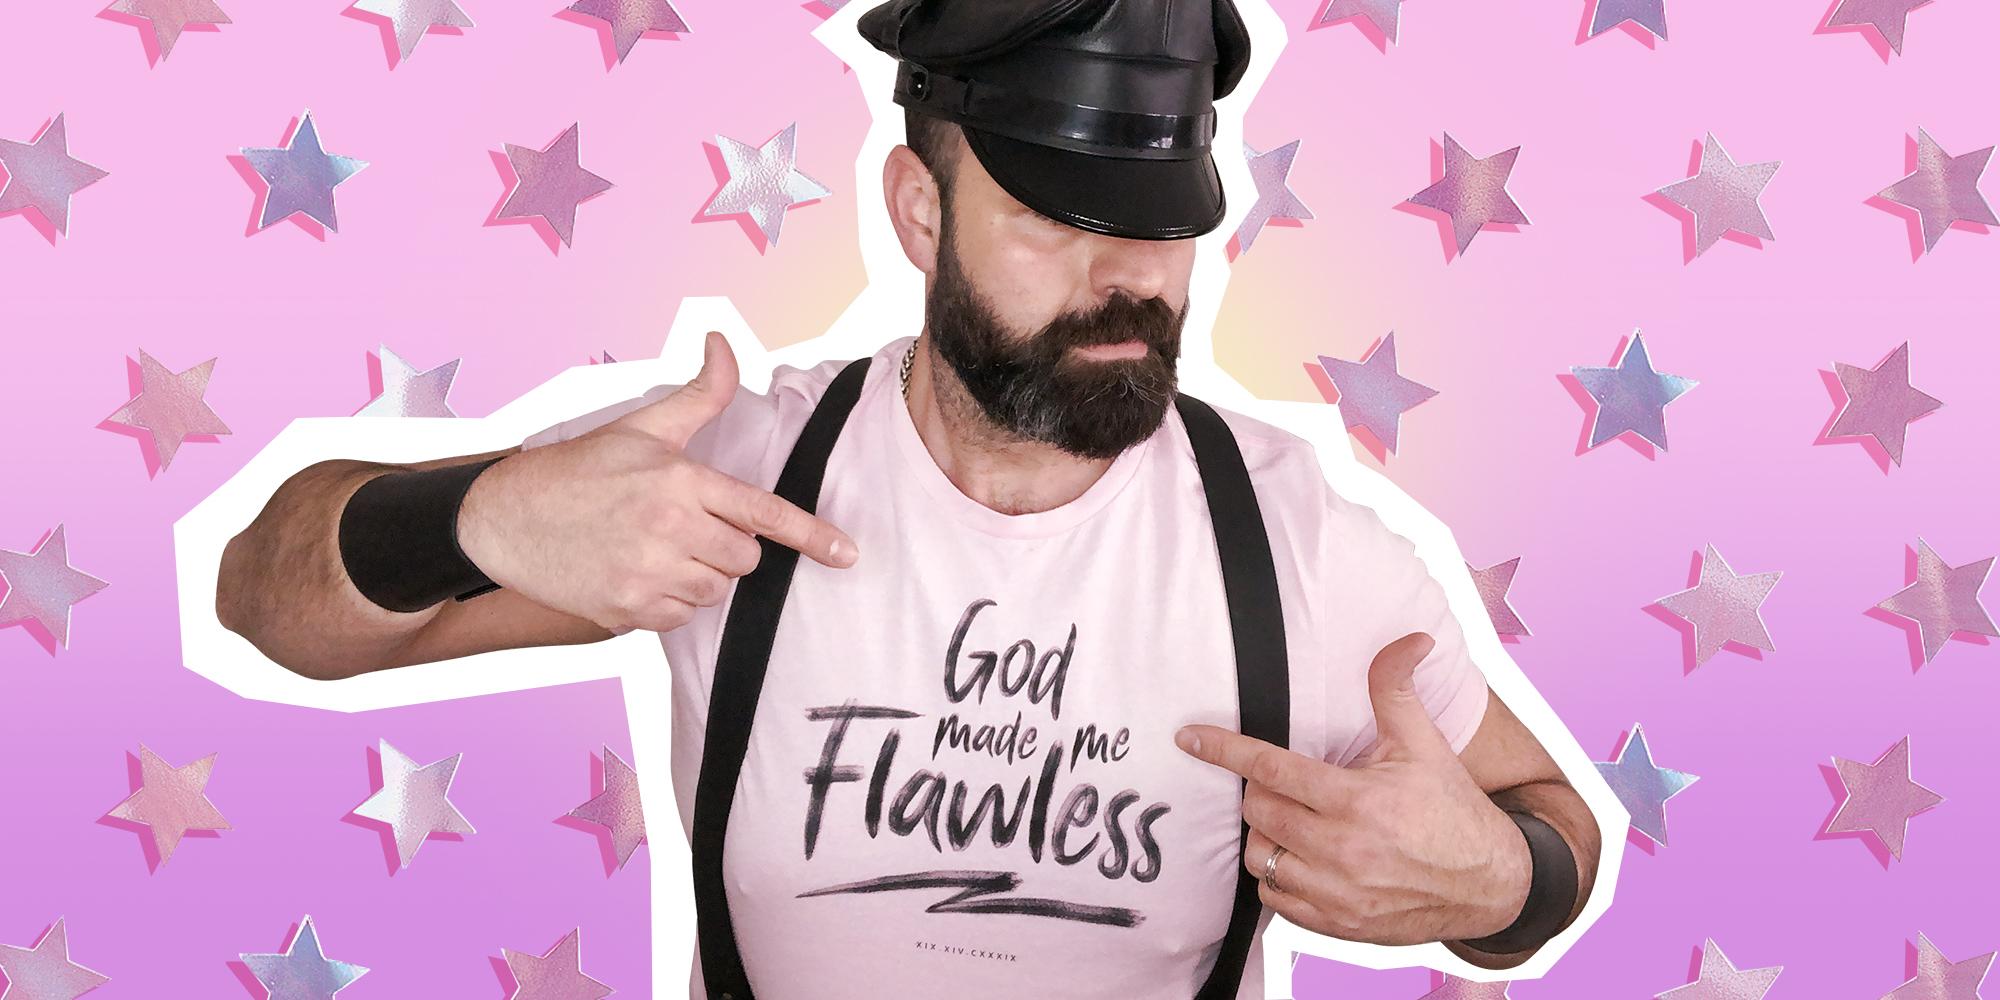 robert-repta-caro-gay-conversion-therapy-christian-leather-man-brother-bro-bear-blog.jpg